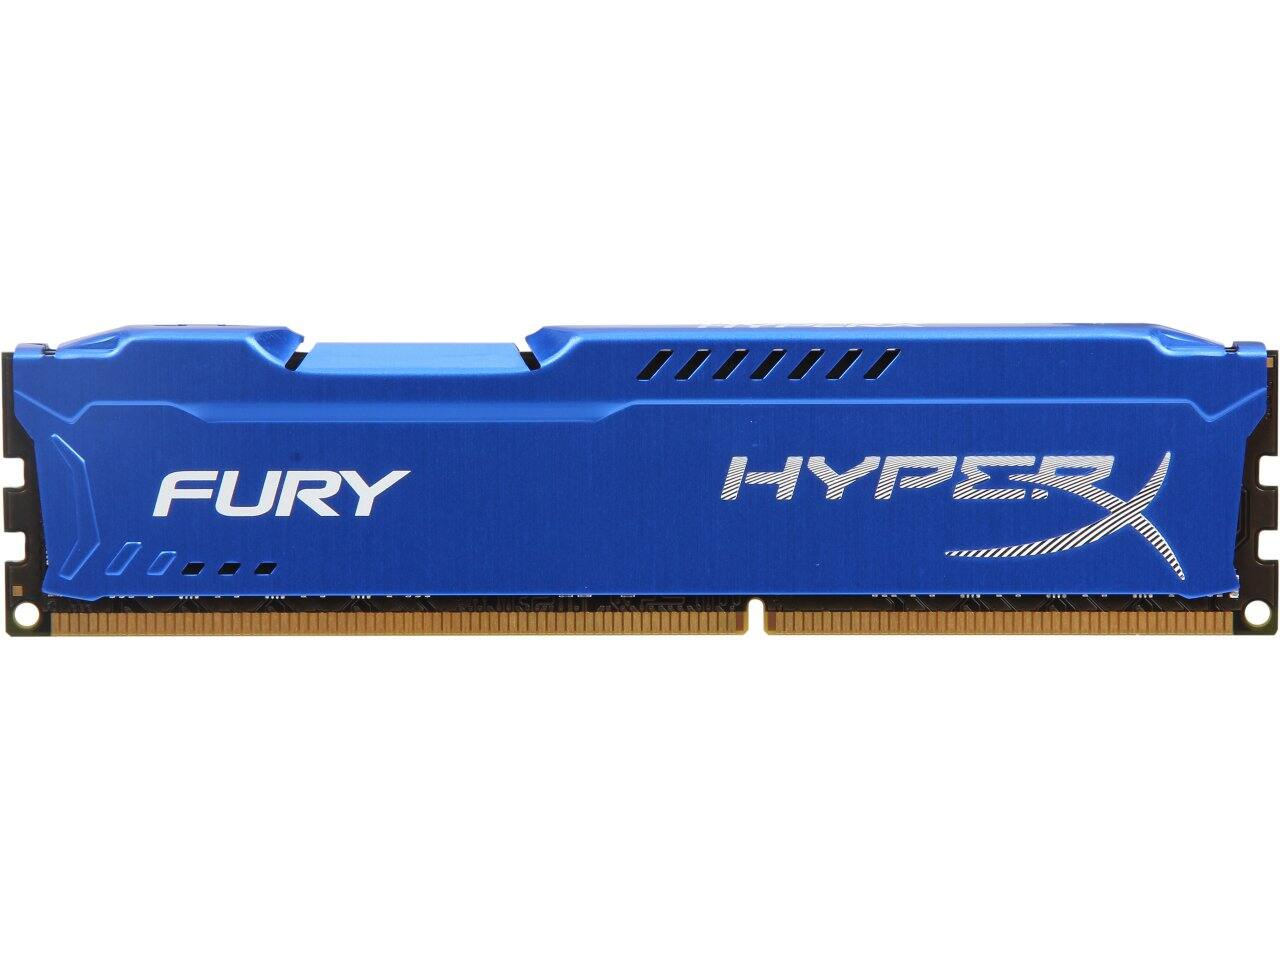 HyperX FURY 8GB (1x8GB) 240-Pin DDR3 SDRAM 1866 Mhz Desktop Memory $38.99 w/FS @ flash.newegg.com